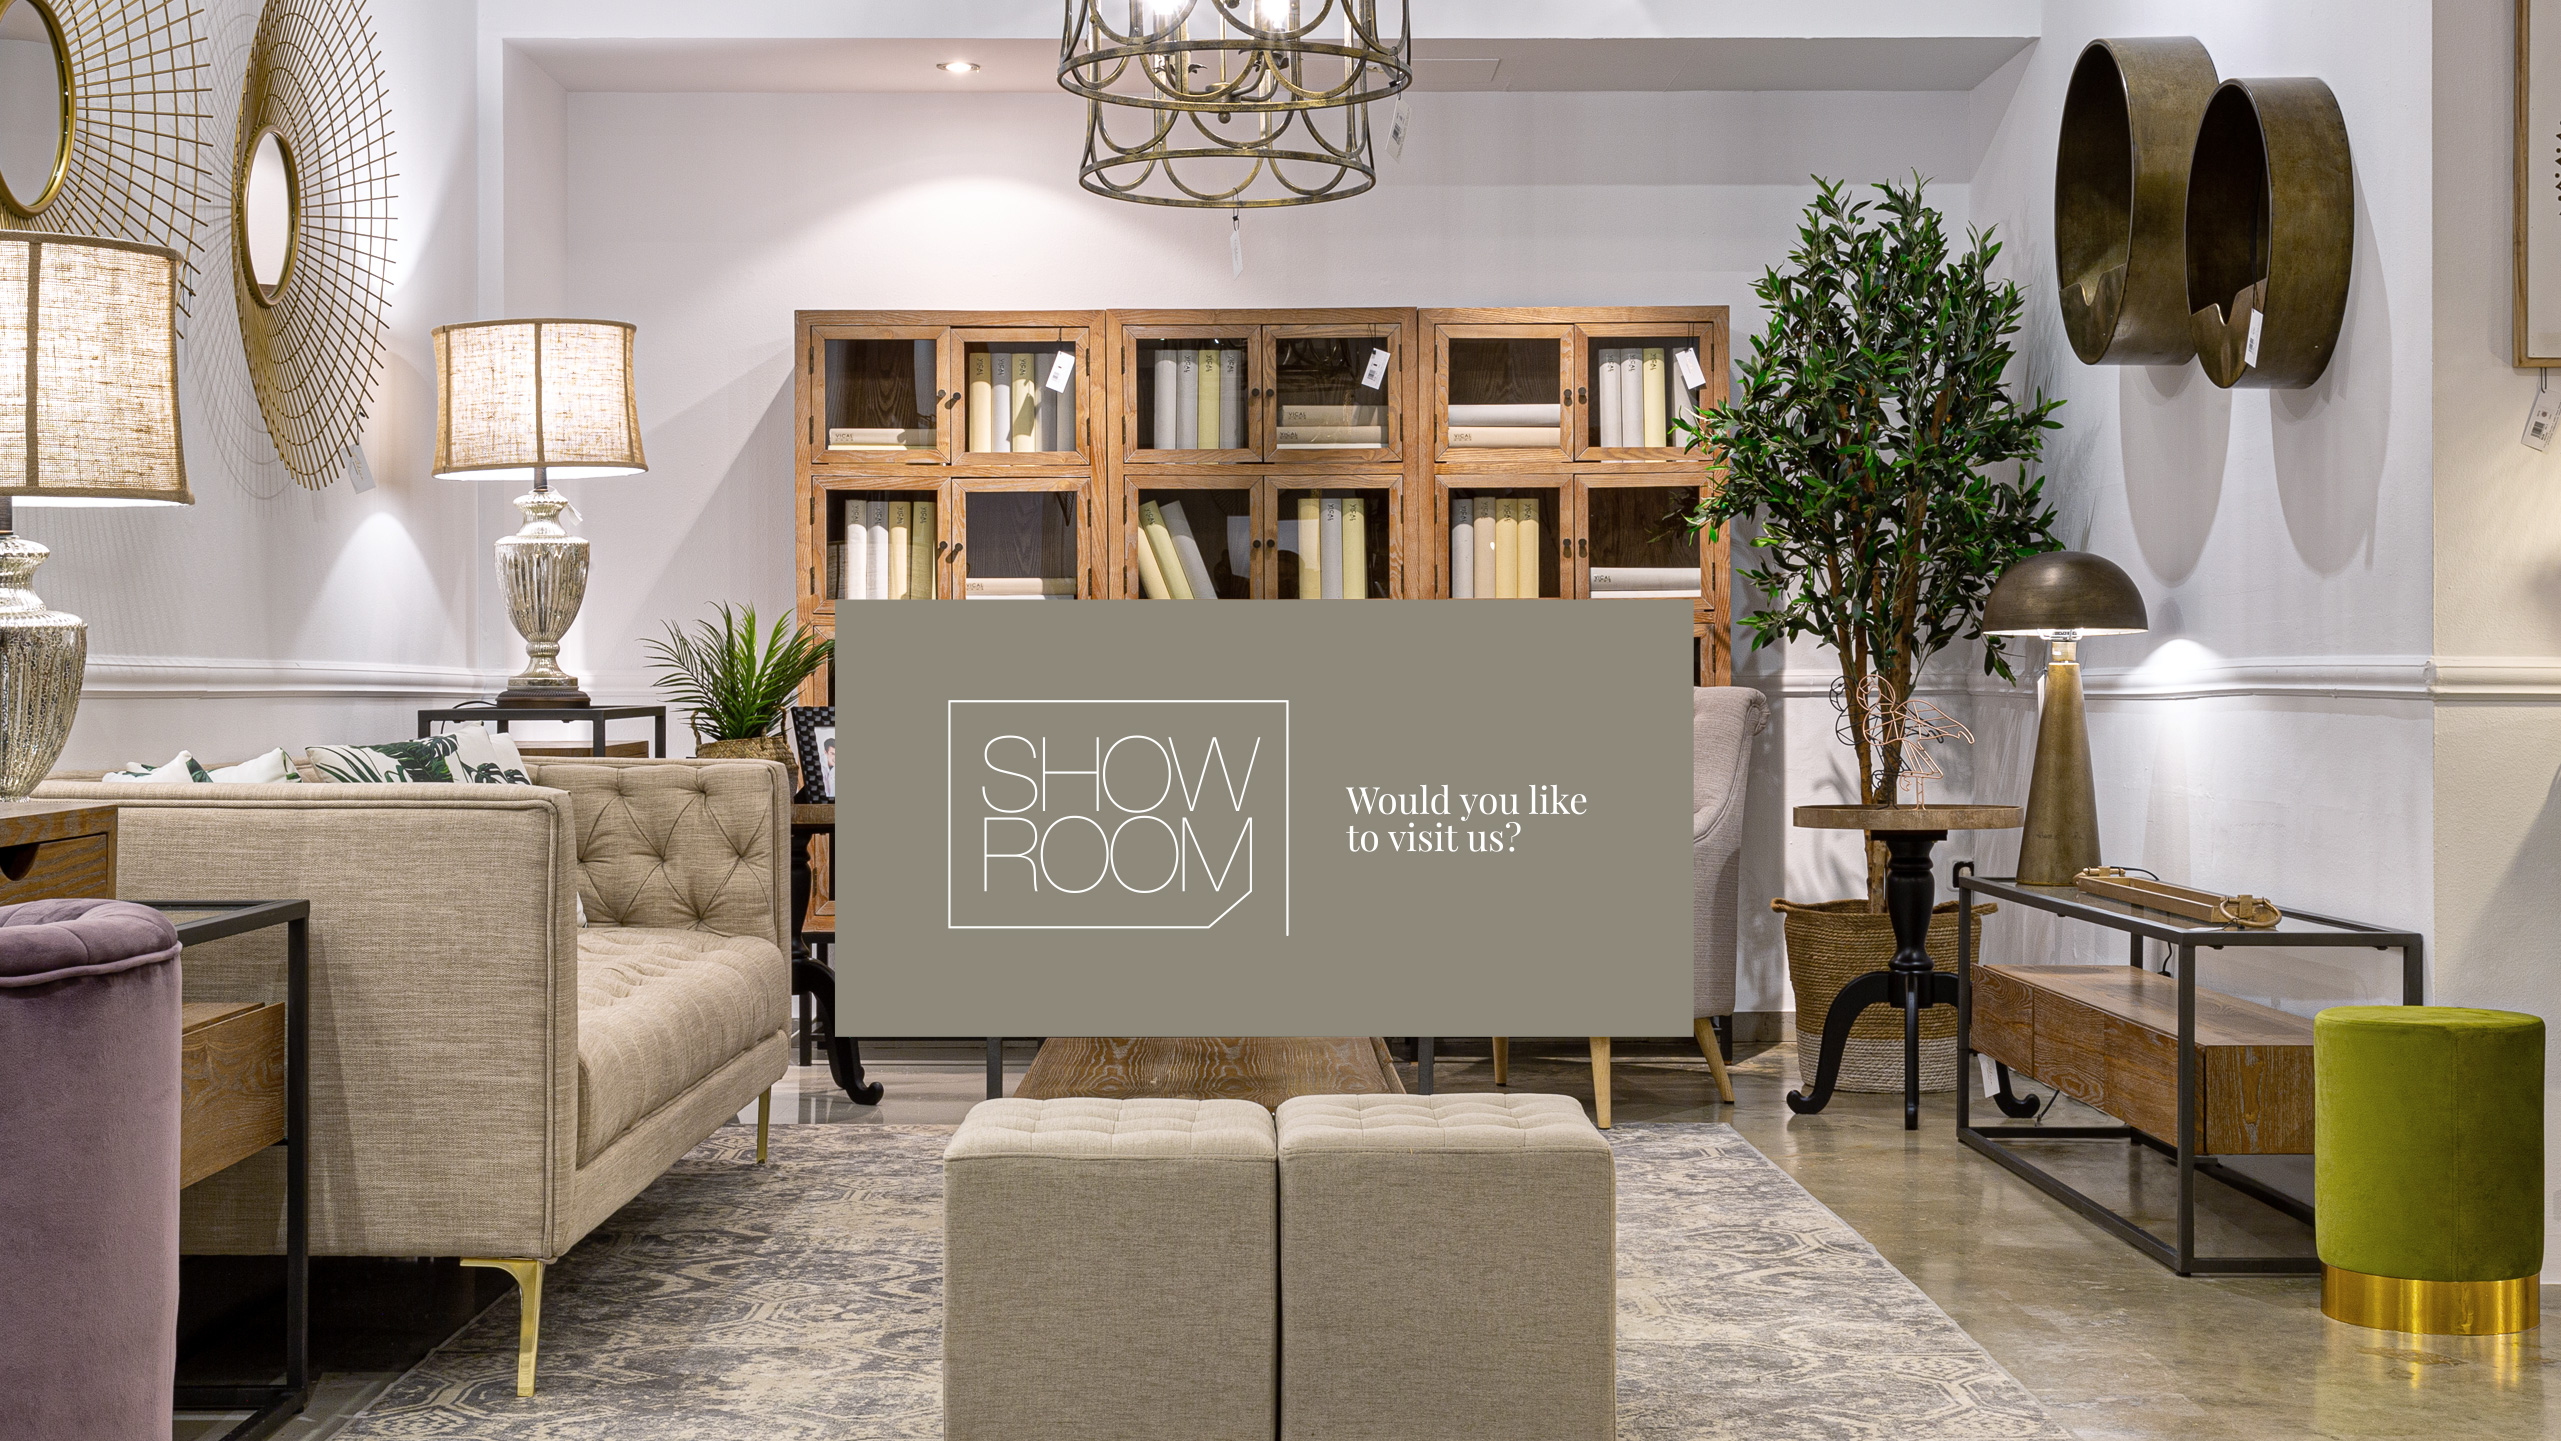 new lastdeco showroom